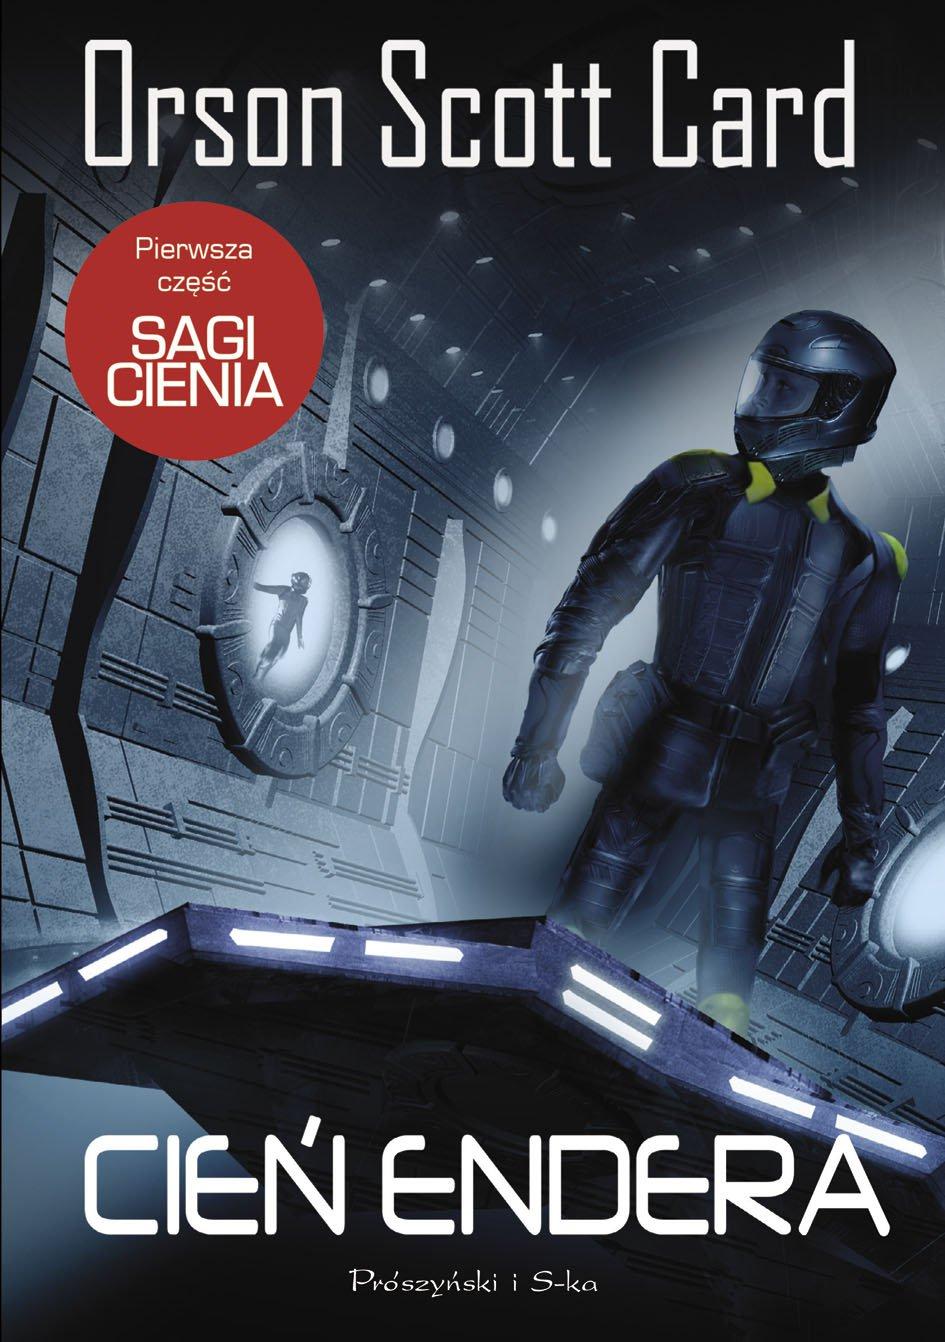 Cień Endera - Ebook (Książka EPUB) do pobrania w formacie EPUB